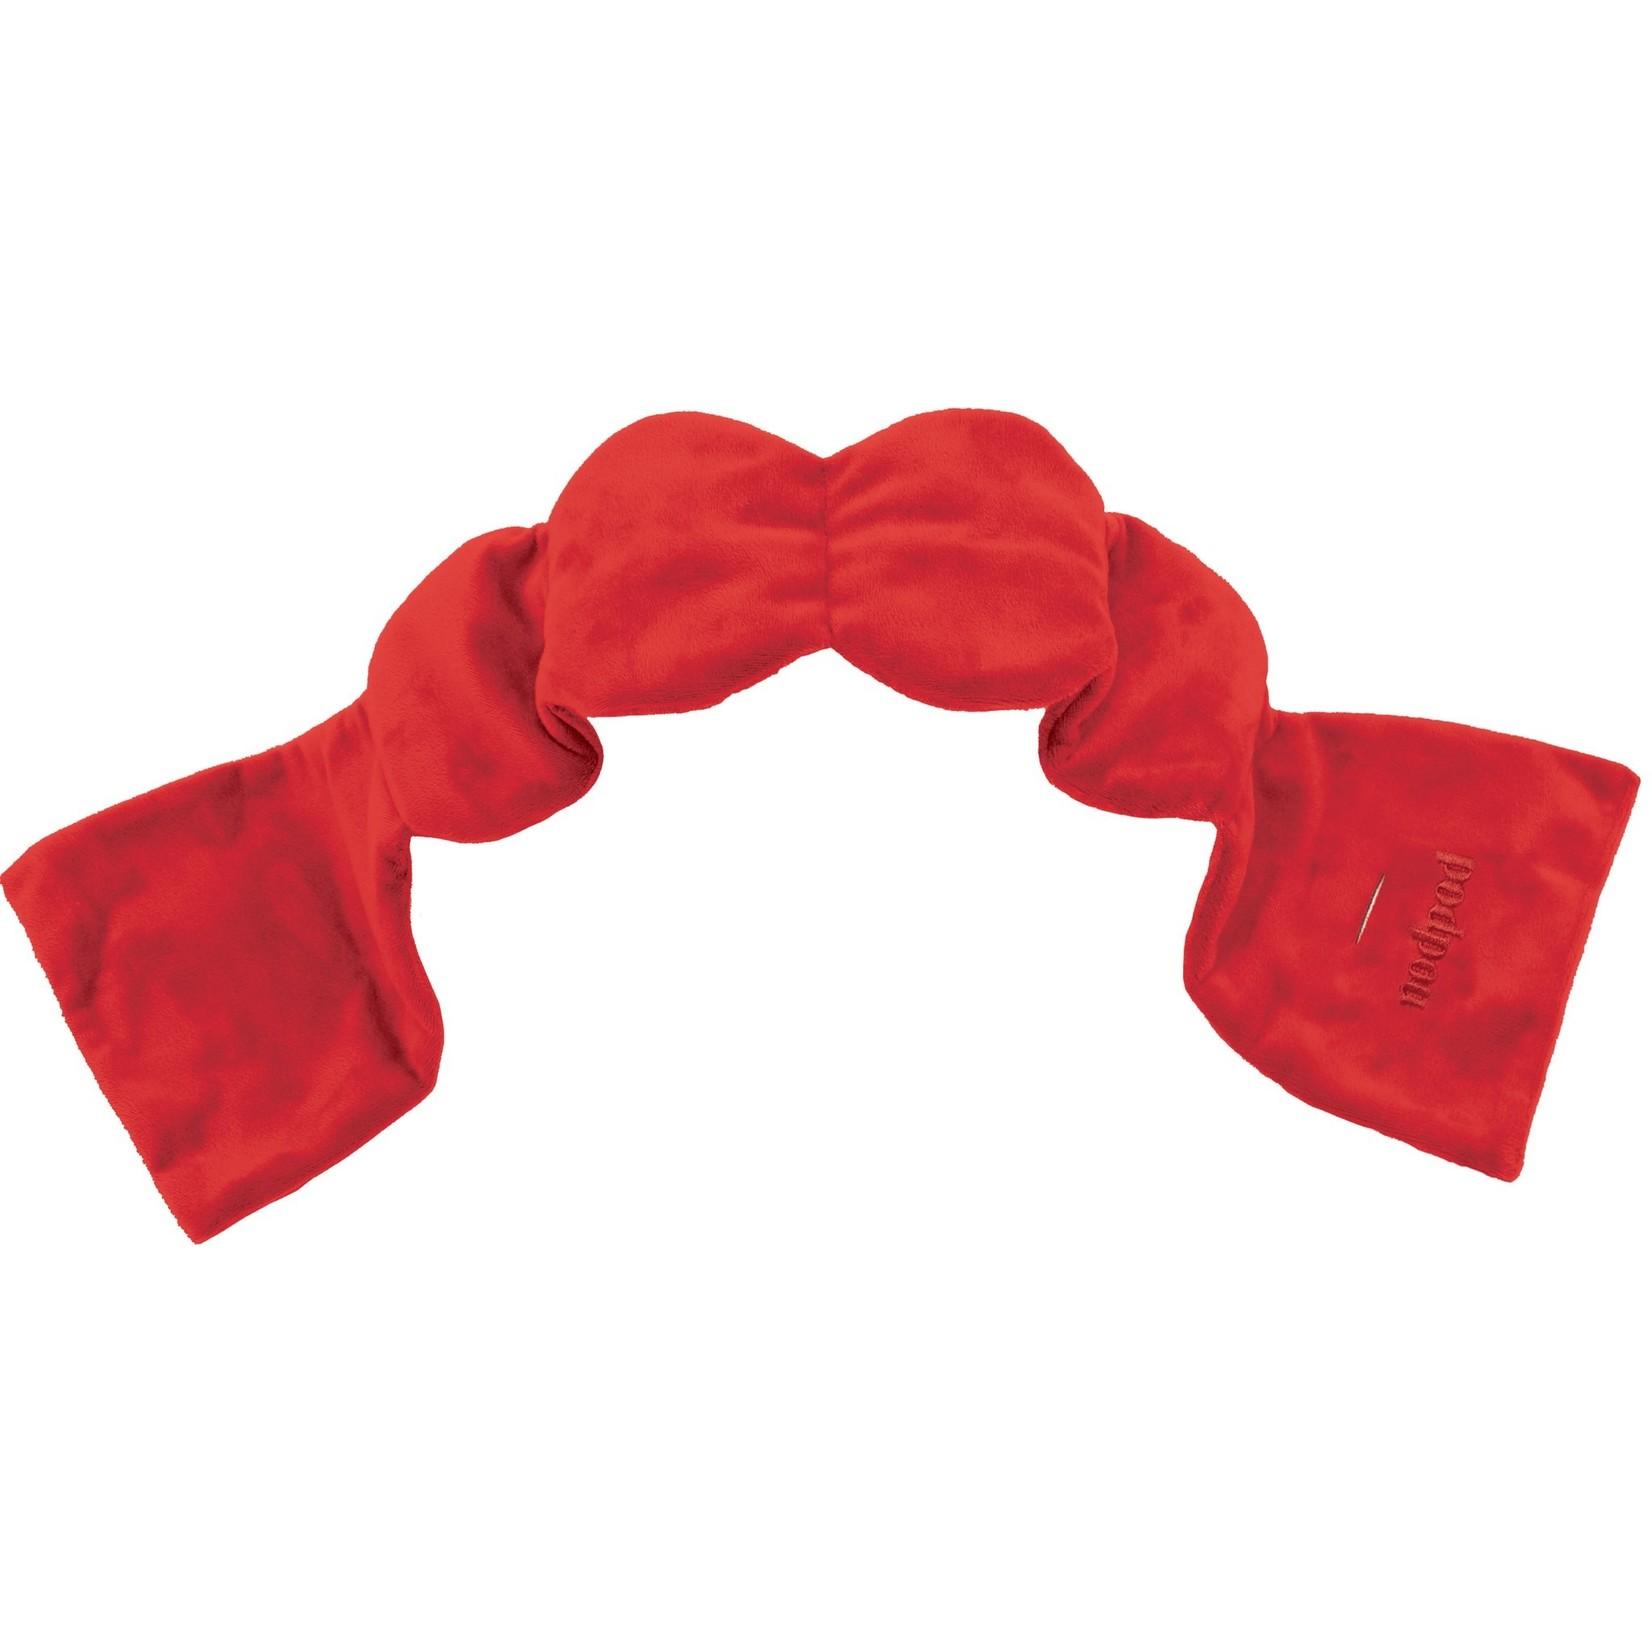 nodpod Weighted Sleep Mask Cherry Red